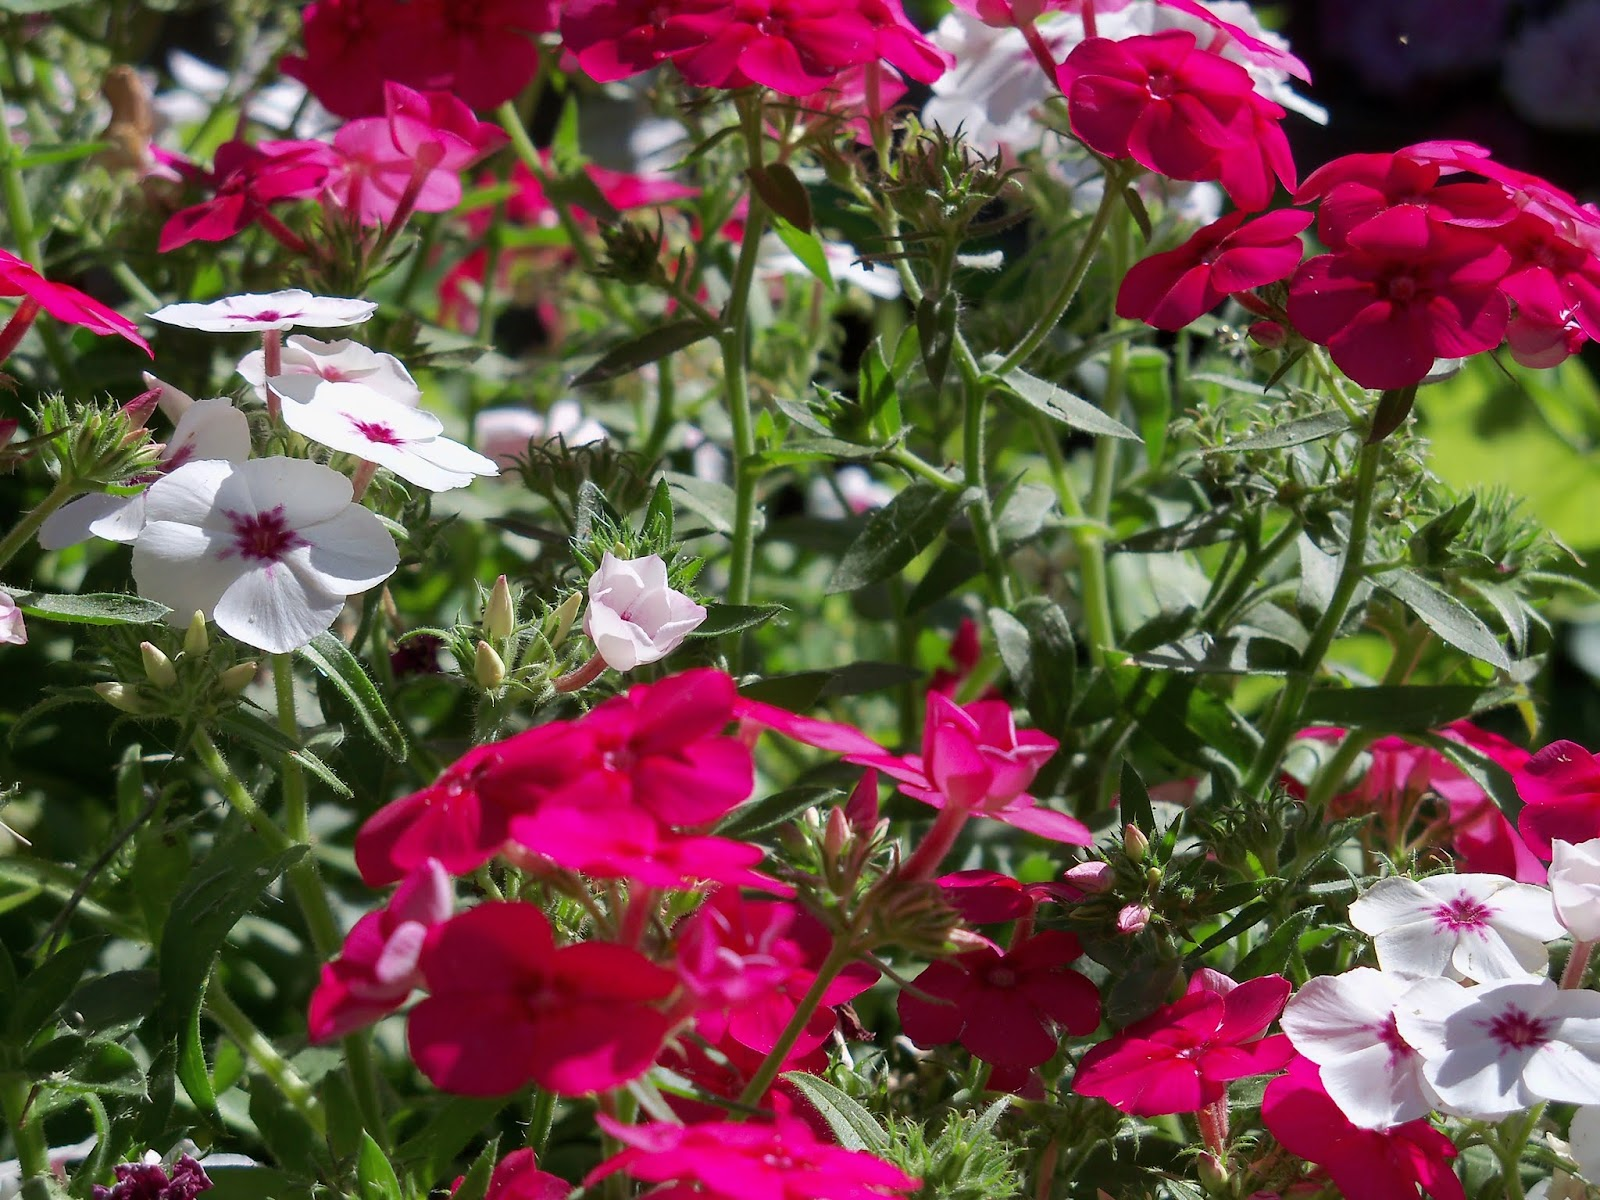 Gardening 2013 - 115_6223.JPG